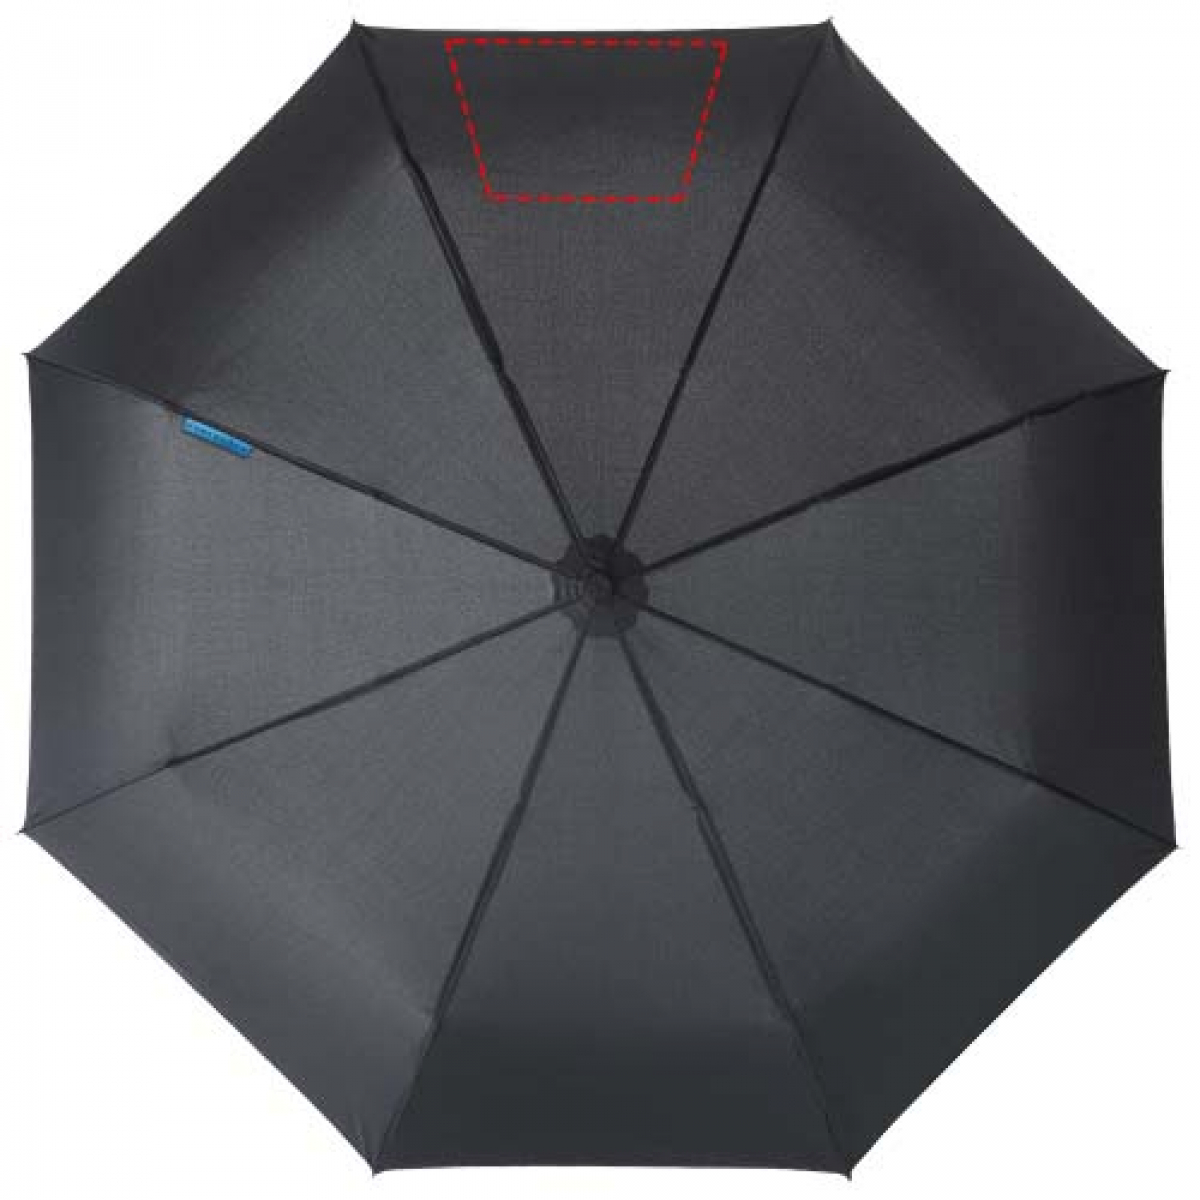 Marksman 3-delige opvouwbare paraplu - 7de paneel